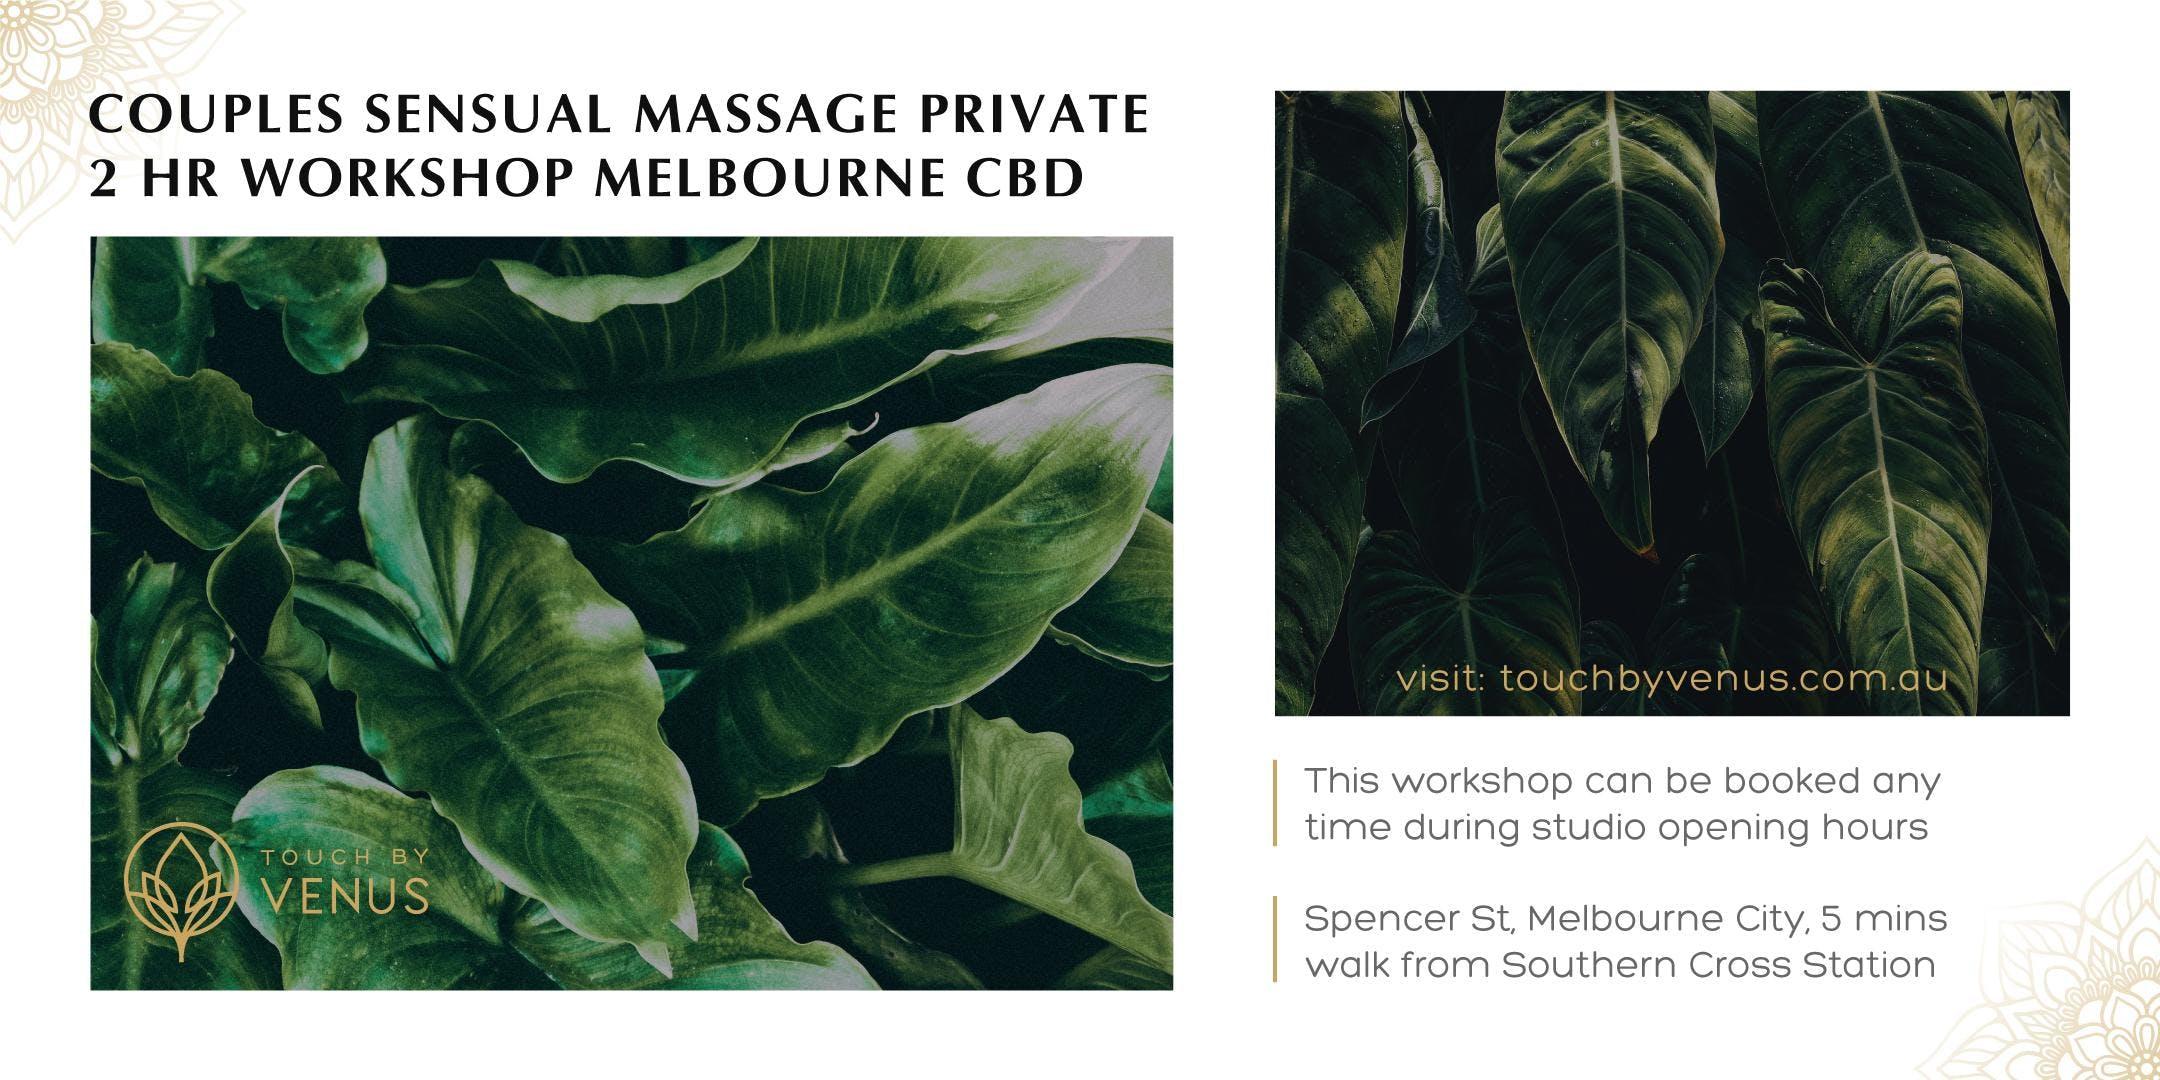 Couples Sensual Massage Workshop - 2 hour